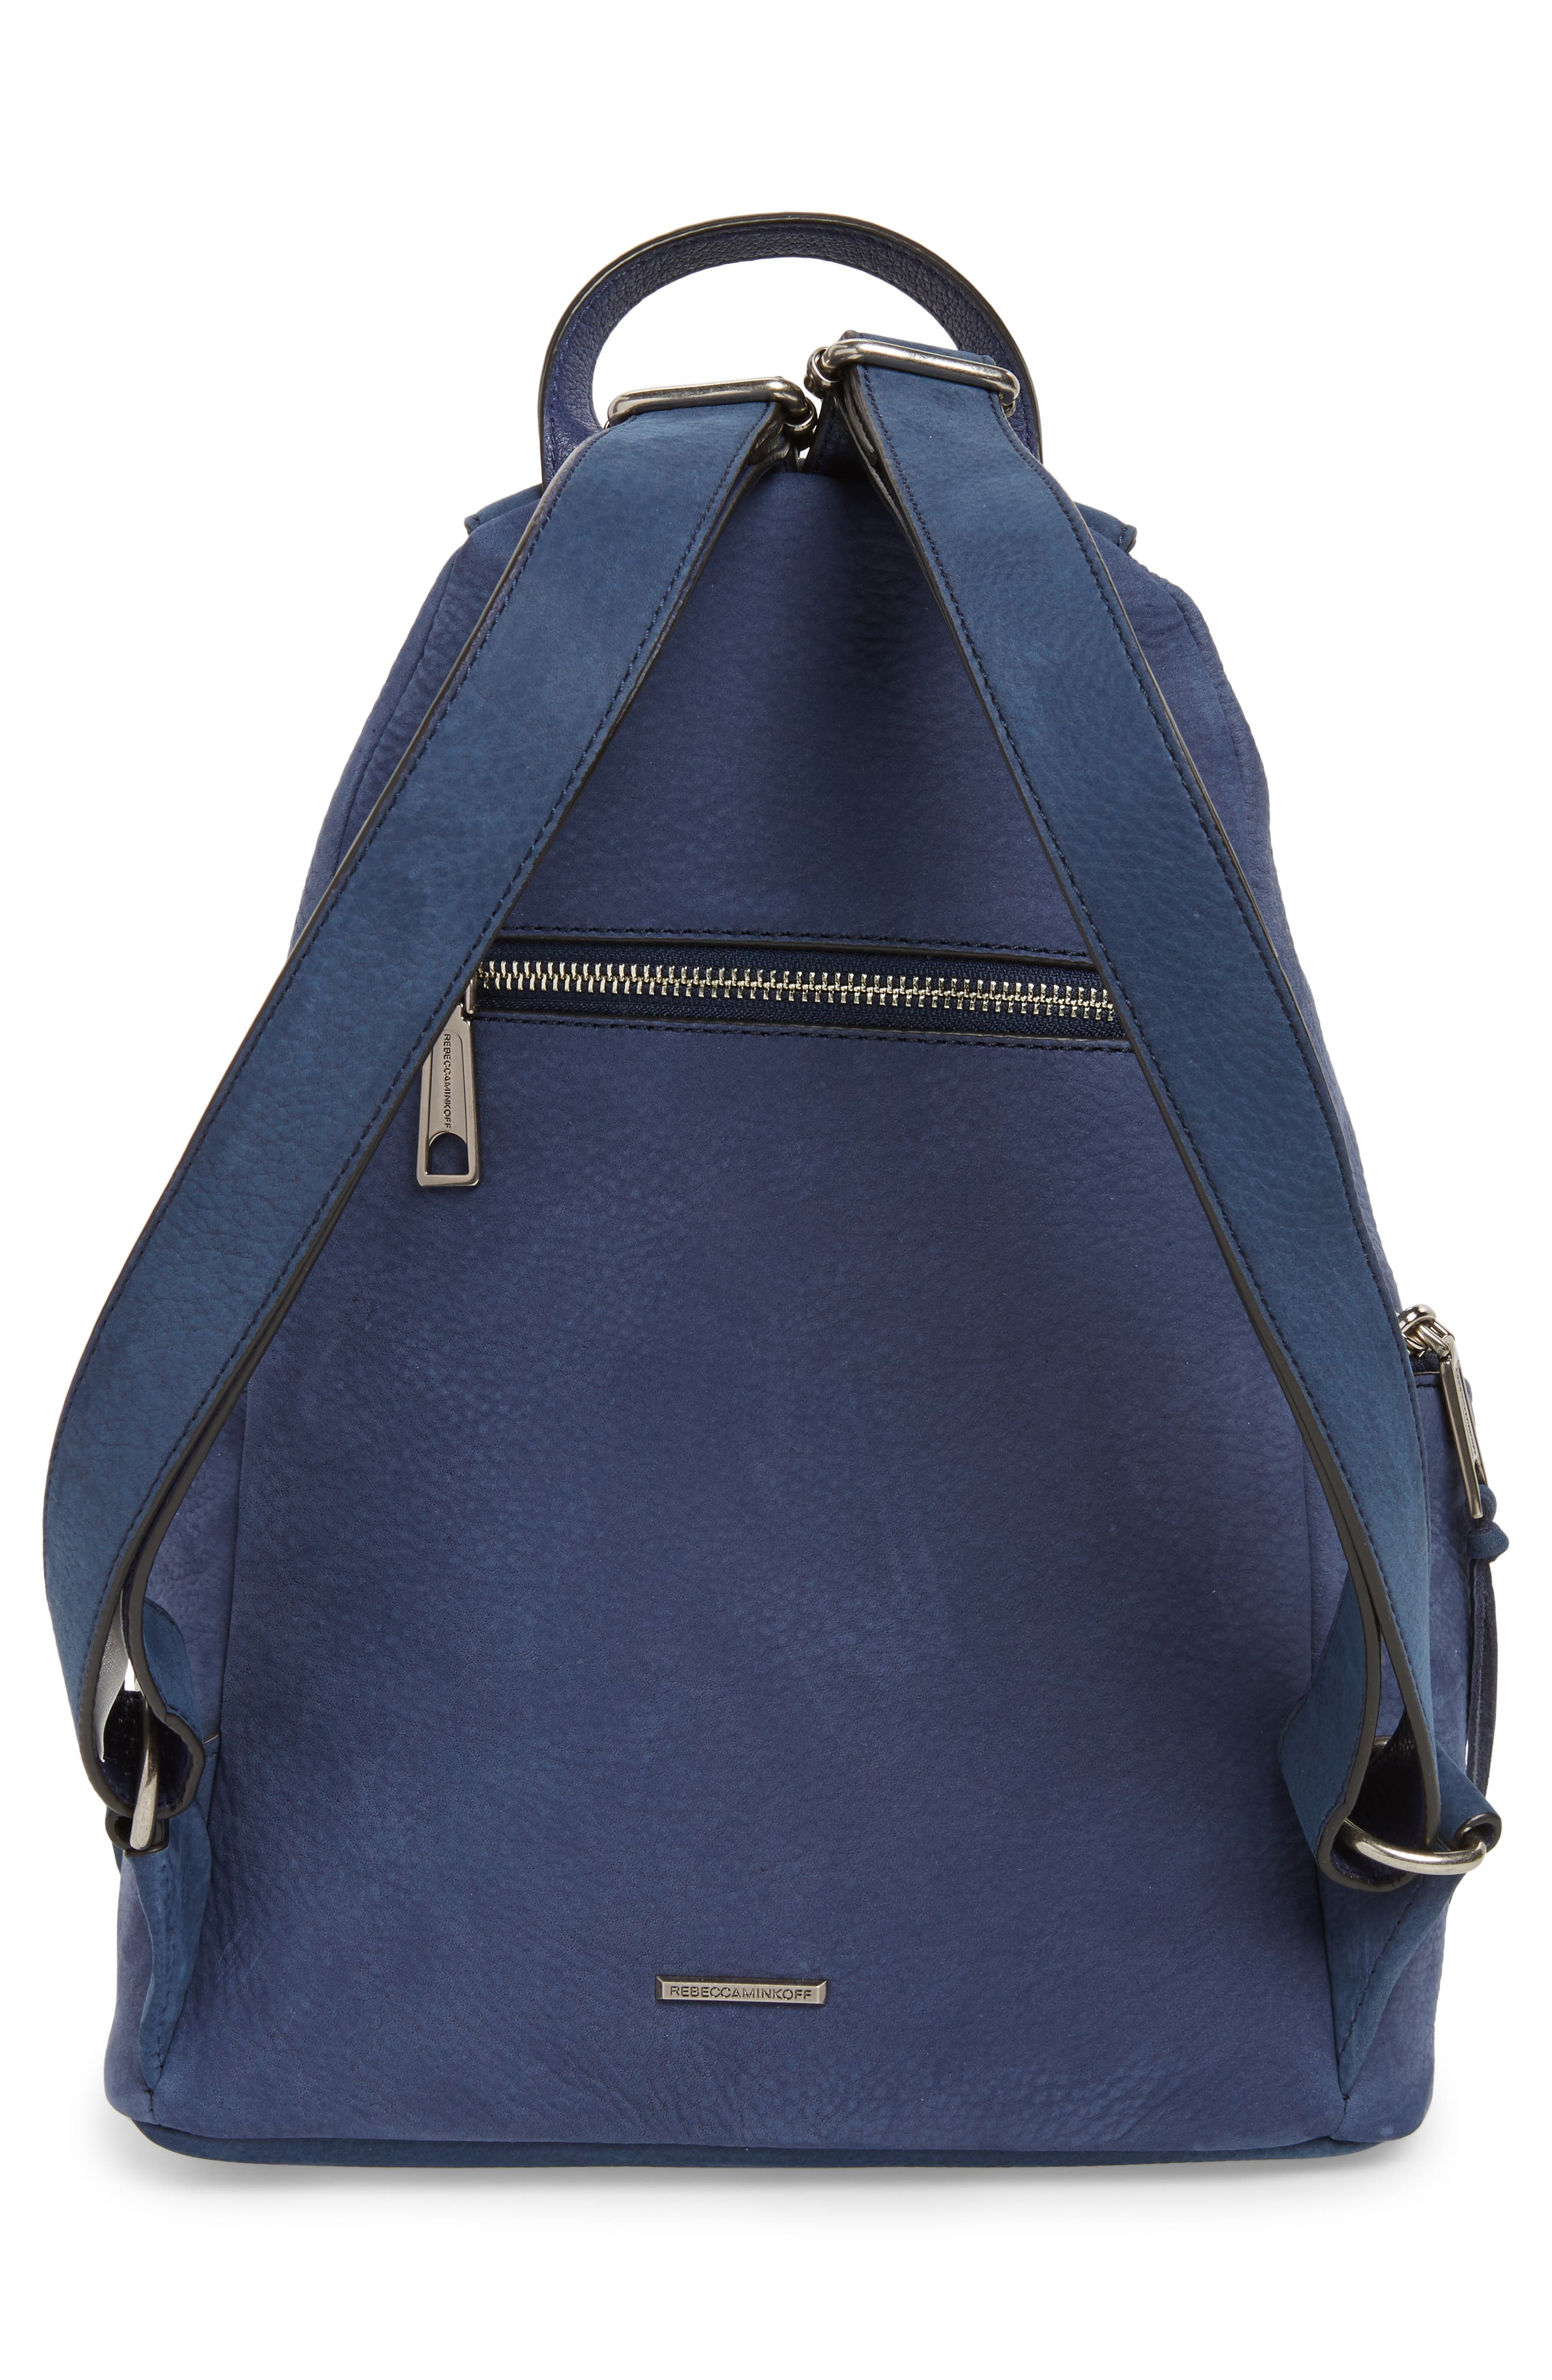 Alternate Image 3  - Rebecca Minkoff Julian Convertible Nubuck Leather Backpack